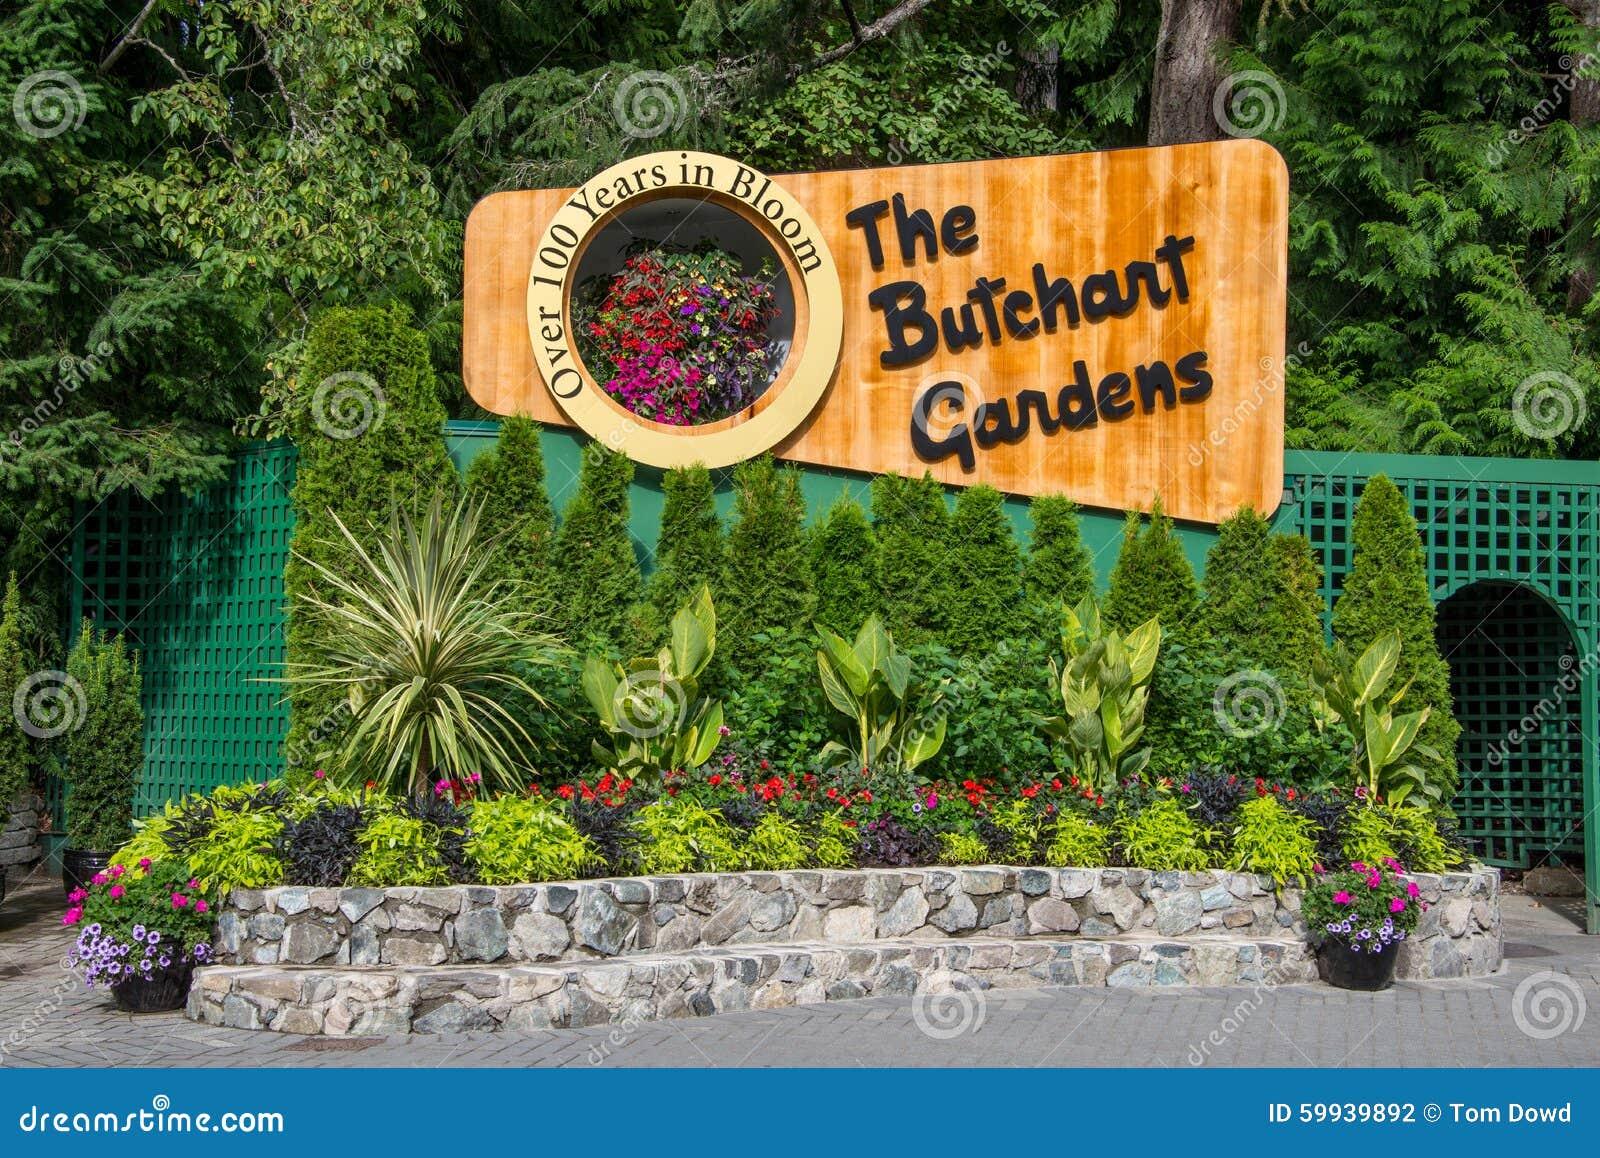 Signage for butchart gardens victoria bc canada editorial download comp altavistaventures Choice Image